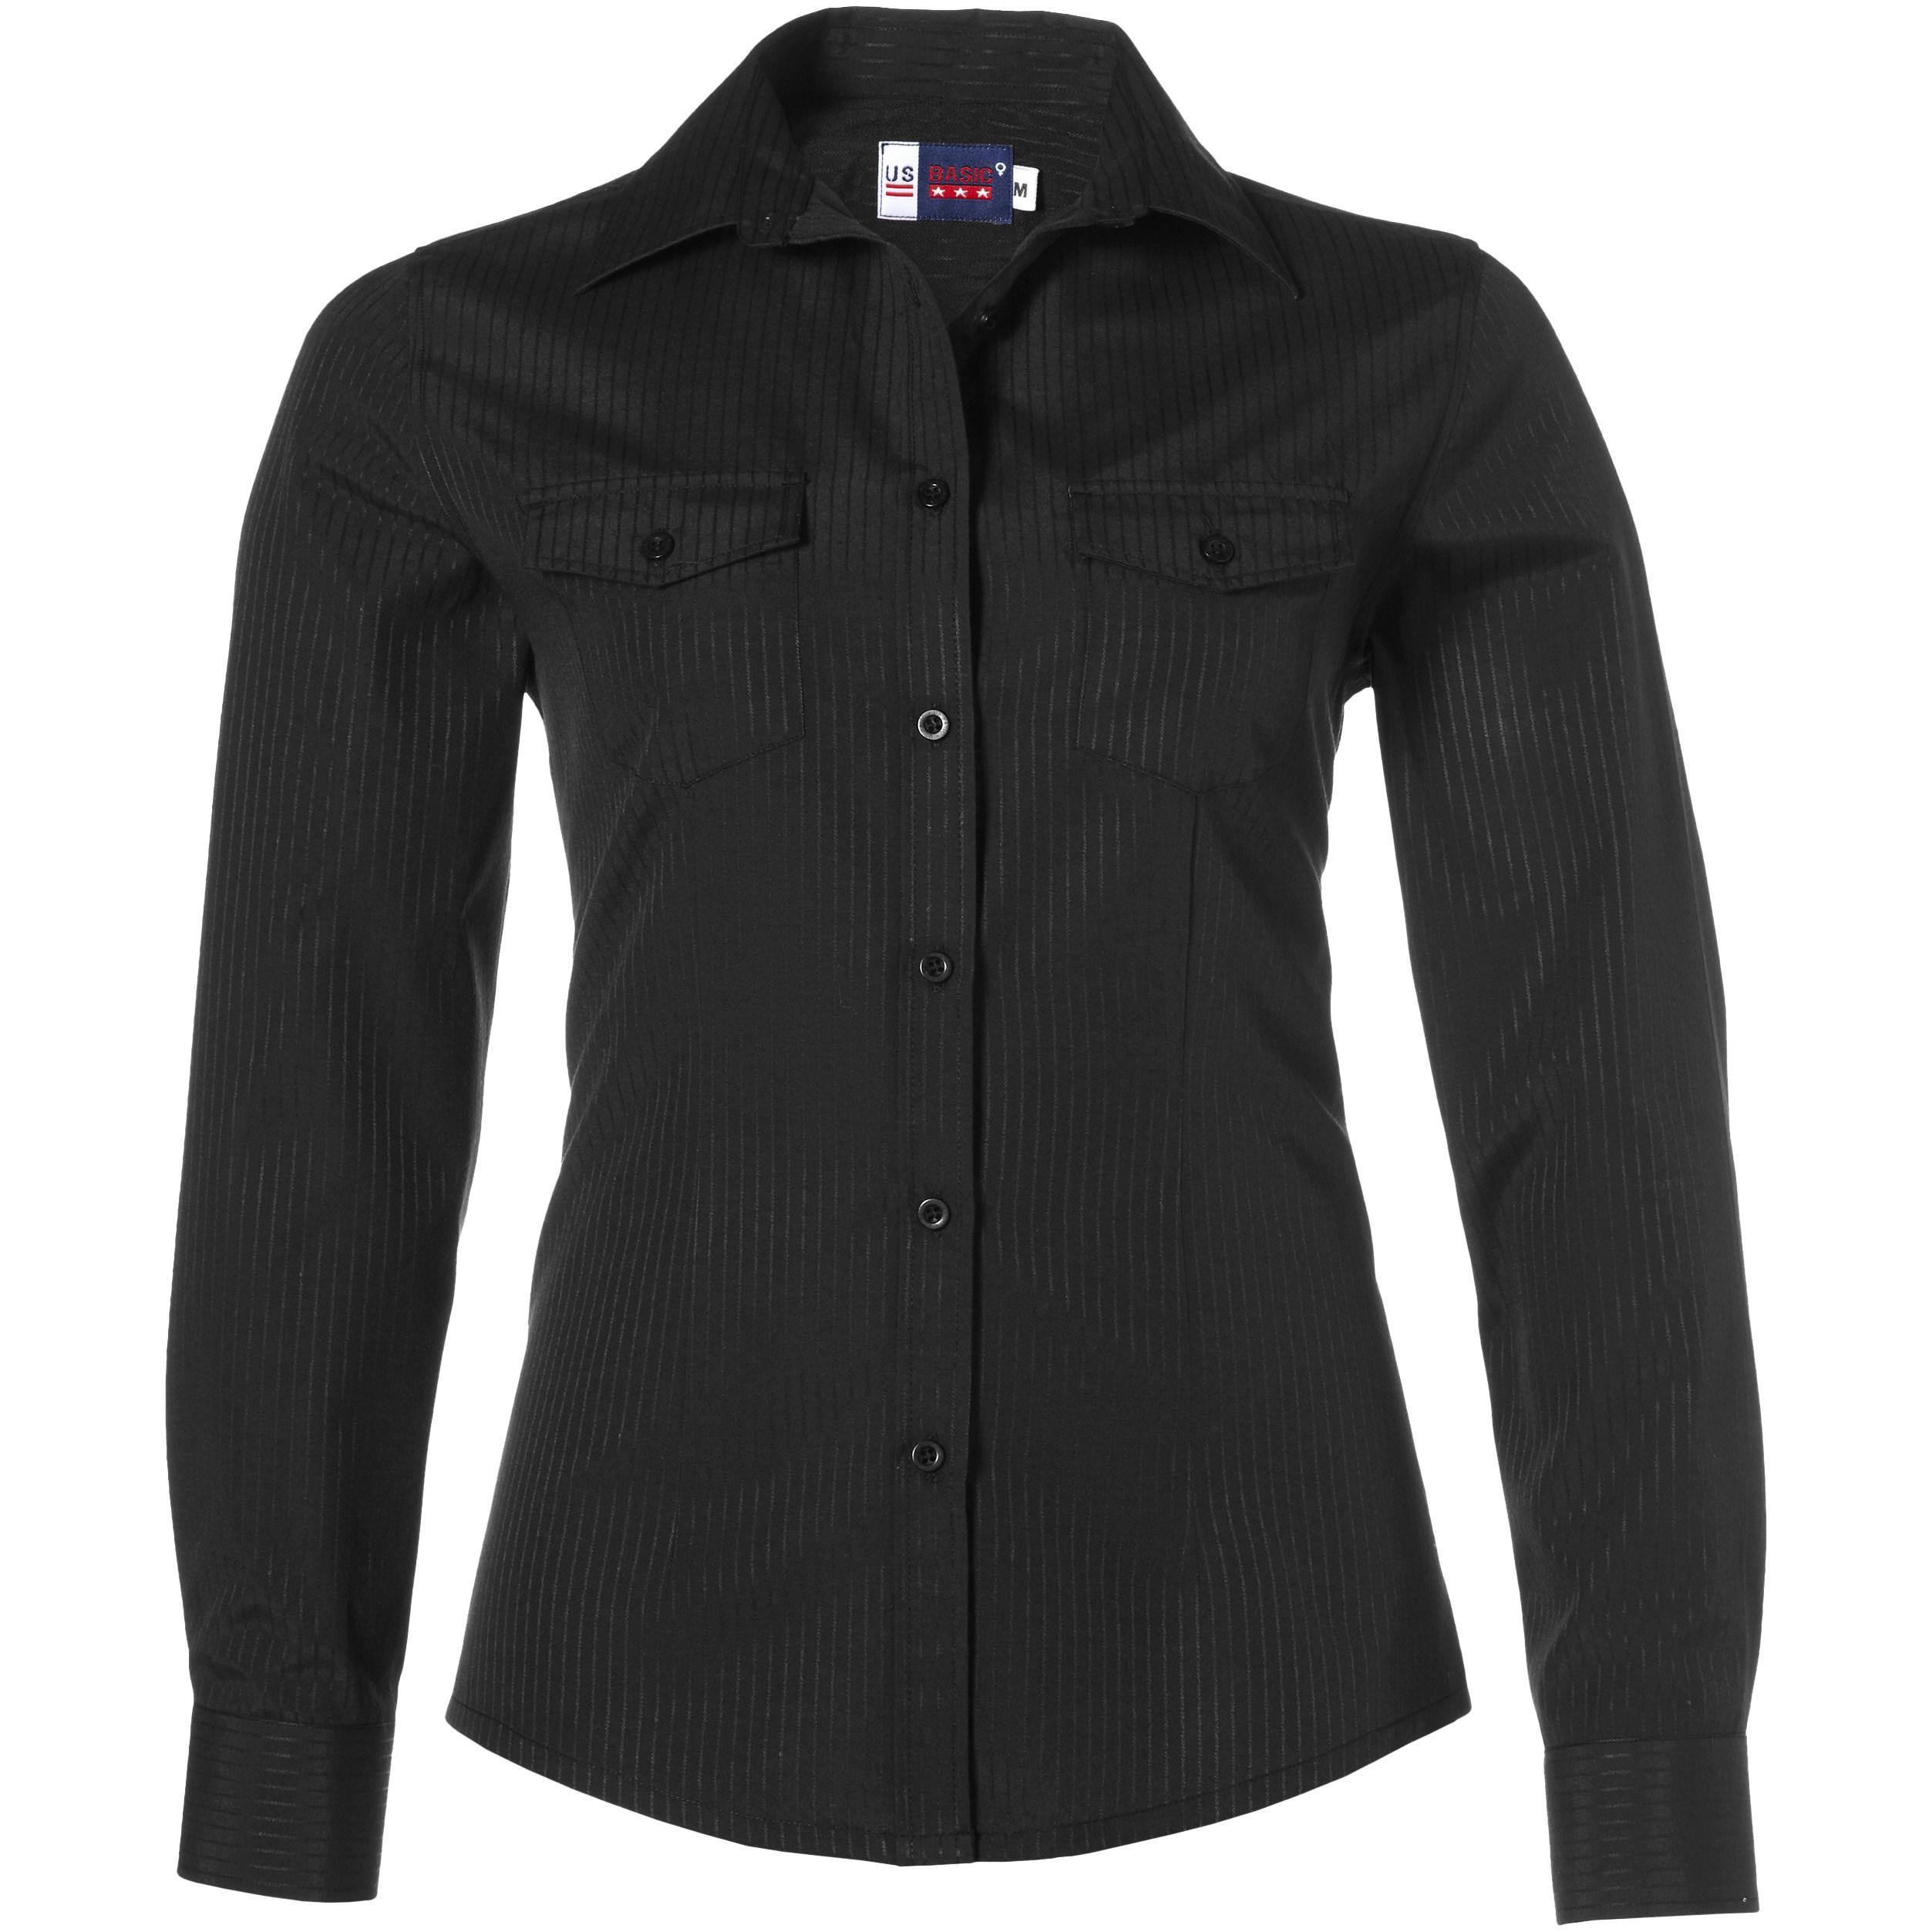 Ladies Long Sleeve Bayport Shirt - Black Only